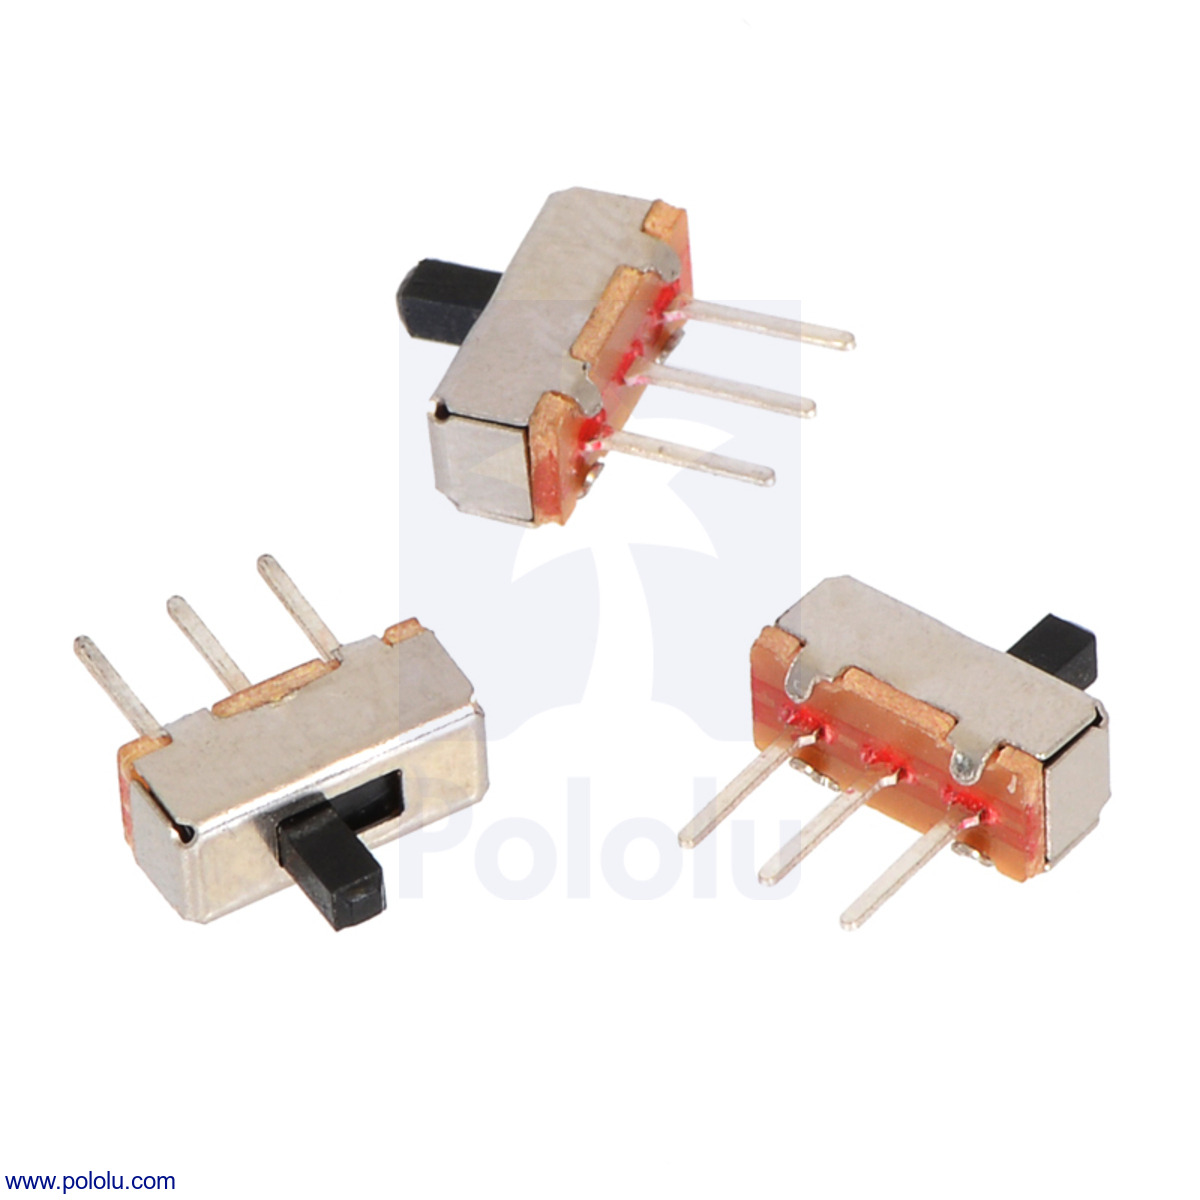 pololu mini slide switch 3 pin spdt 0 3a 3 pack slide [ 1200 x 1200 Pixel ]